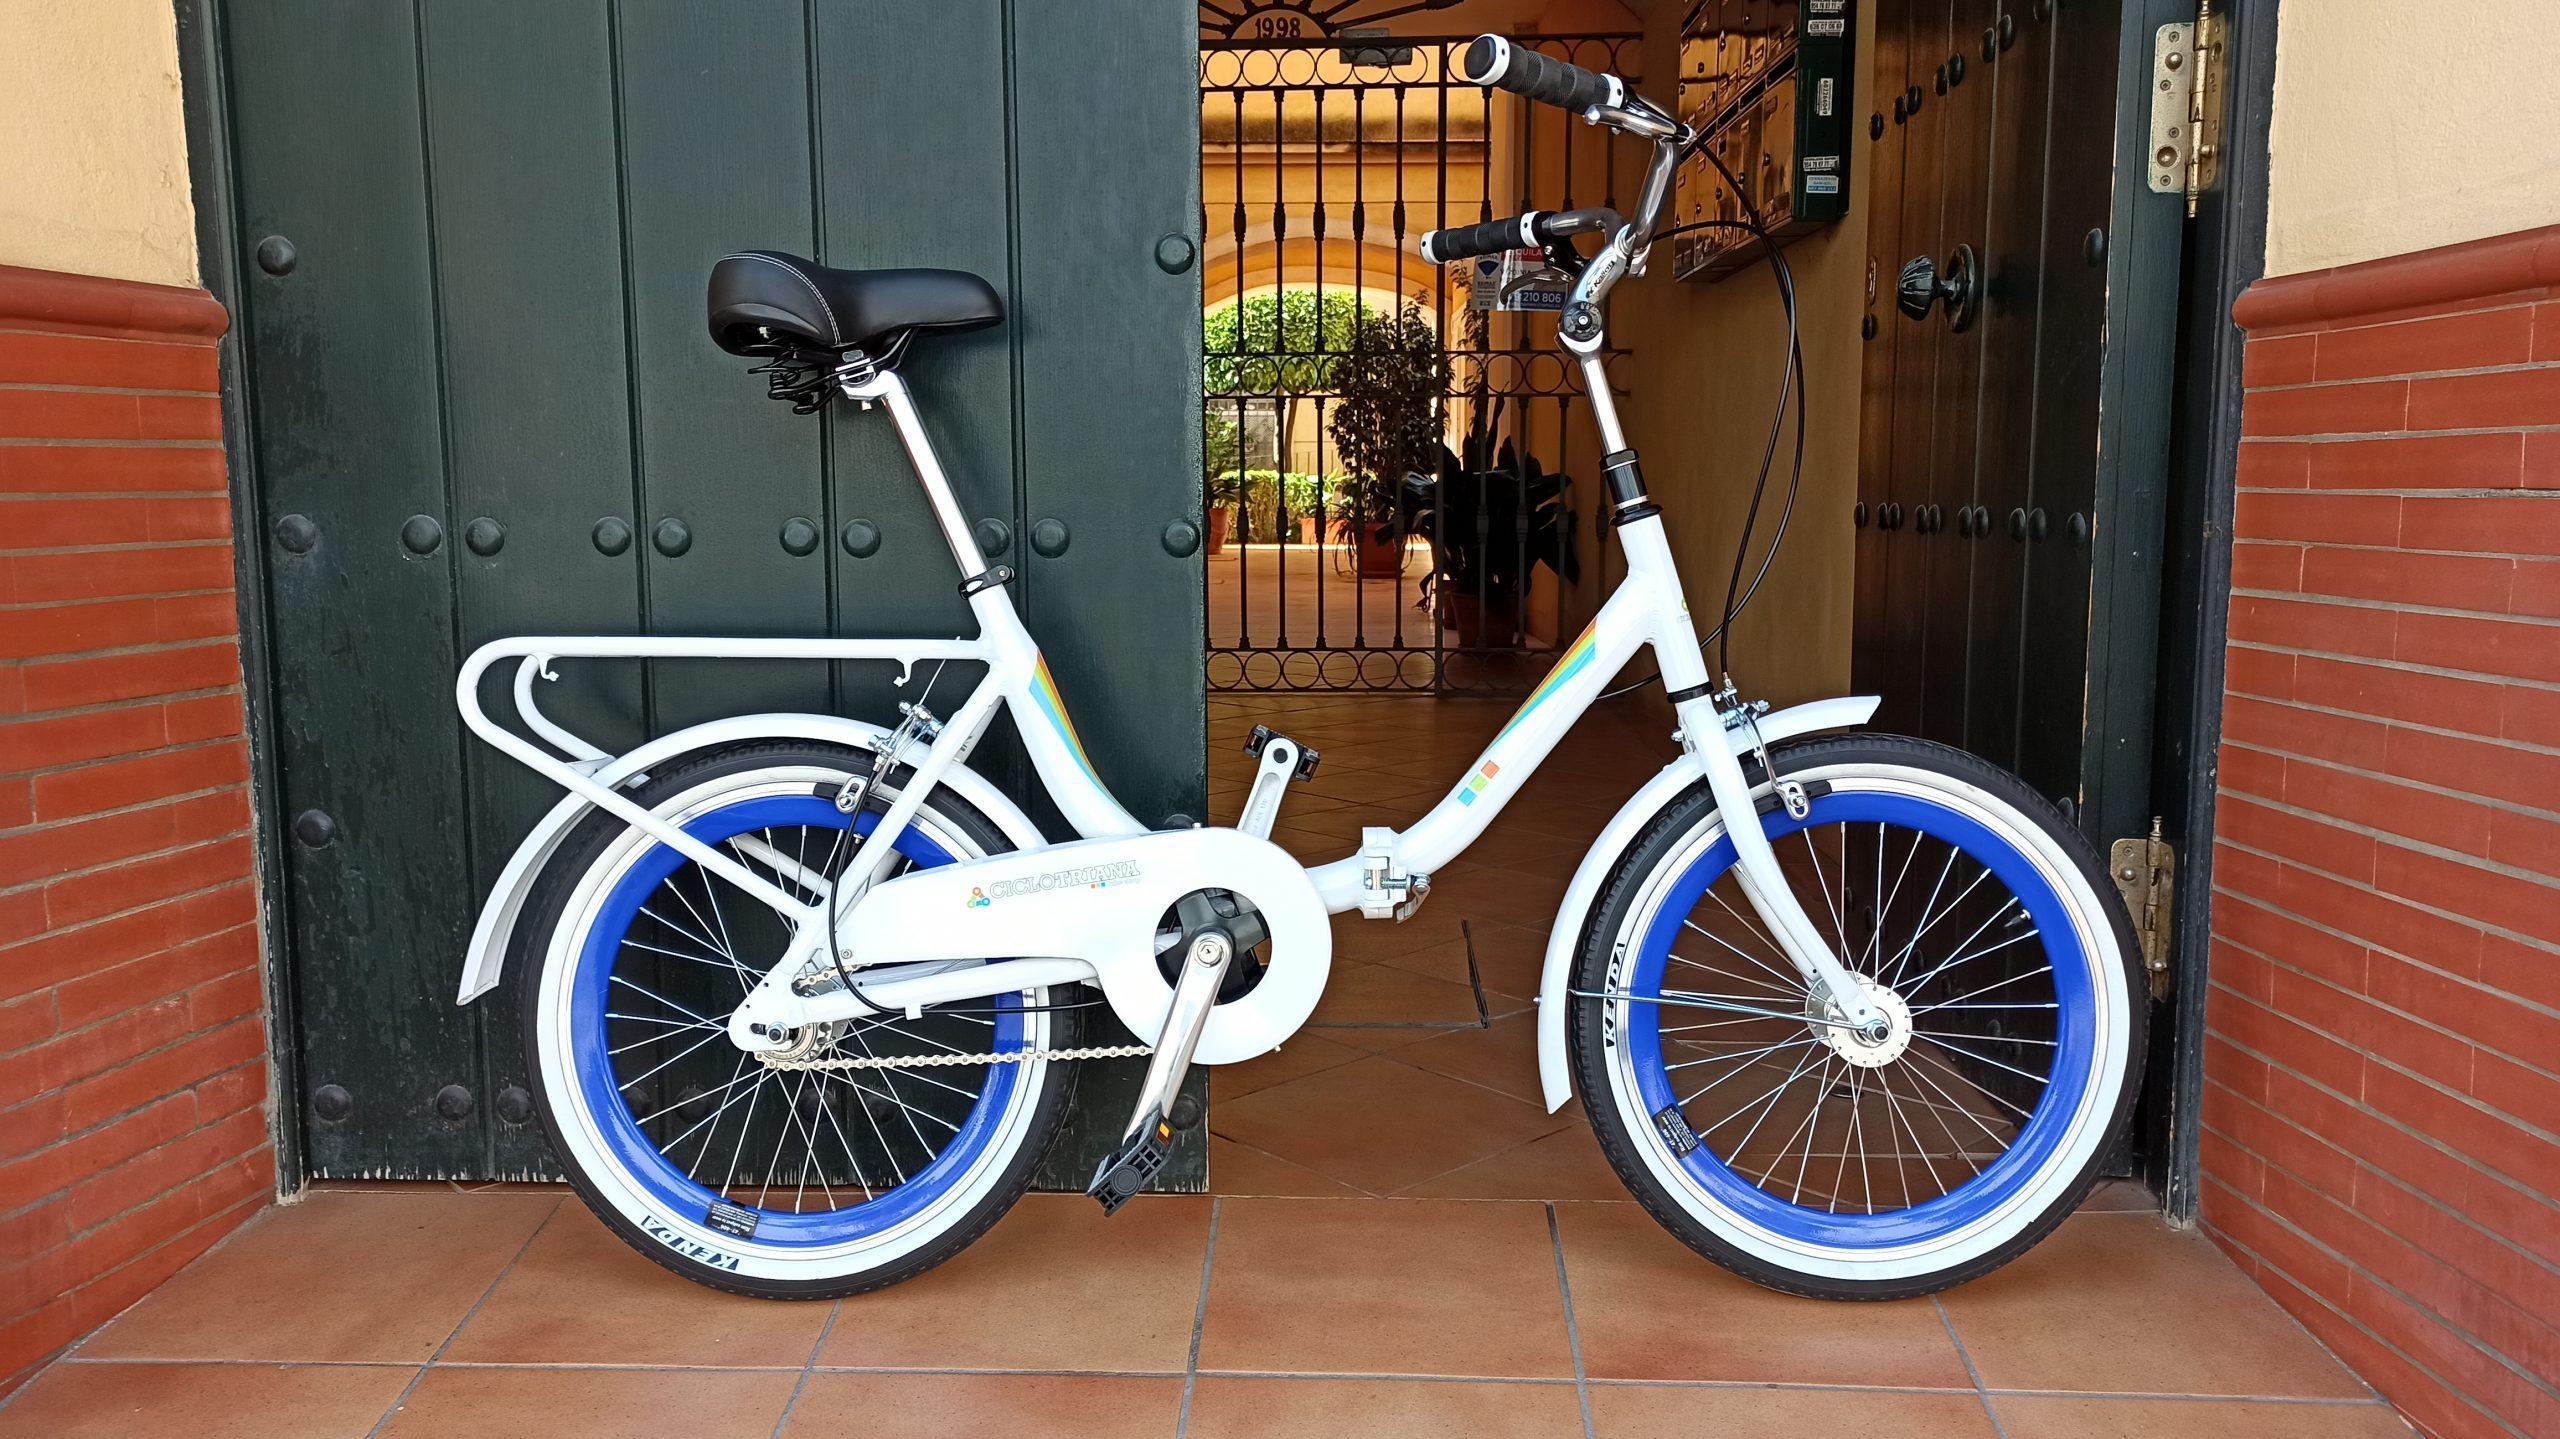 Plegable Single-speed blanca y azul aluminio reforzada